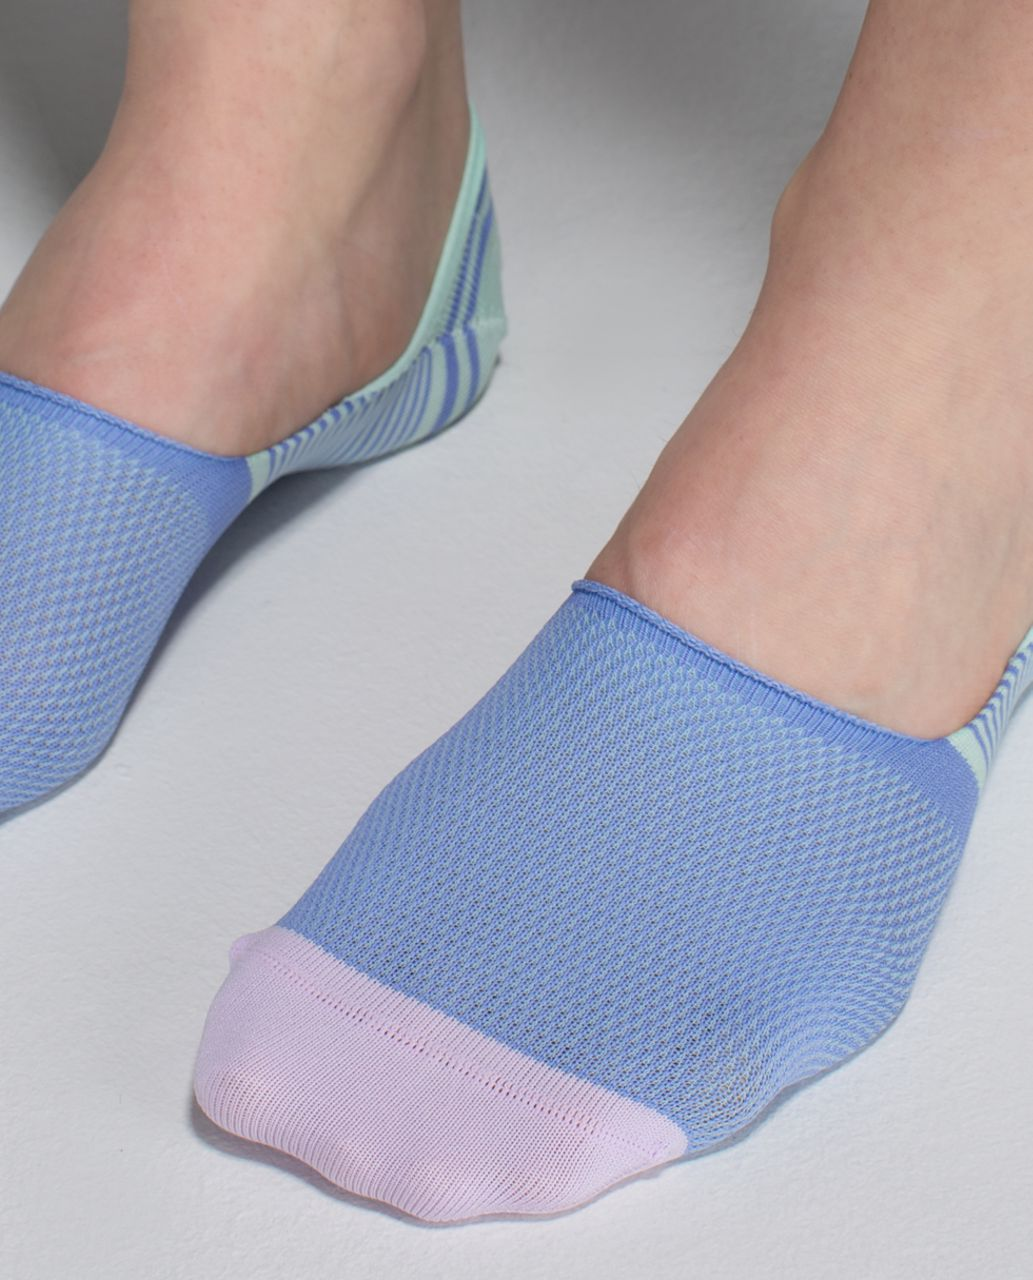 Lululemon Secret Sock - Candy Stripe Lullaby Seamist Pretty Purple